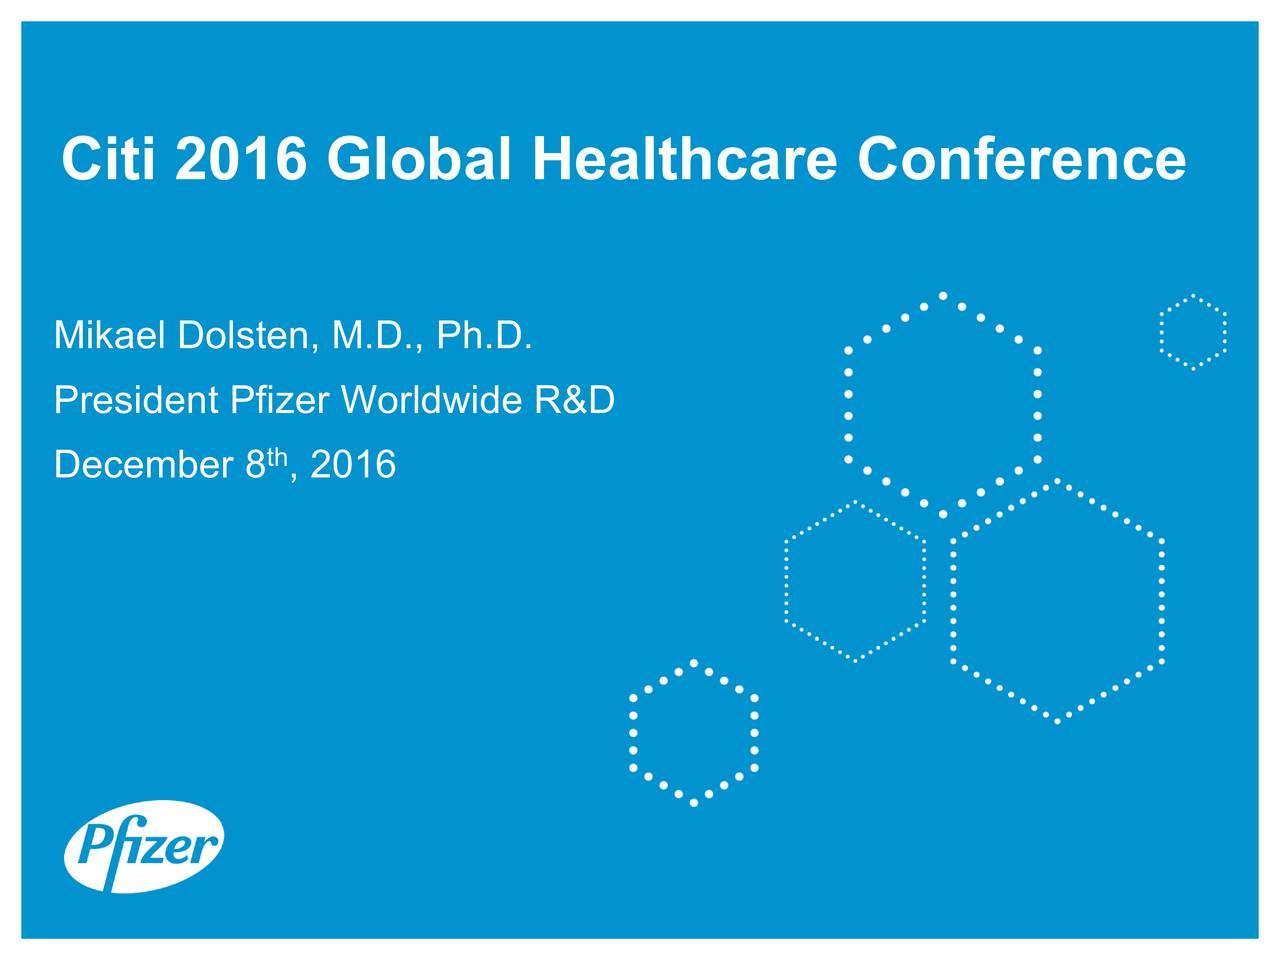 Mikael Dolsten, M.D., Ph.D. President Pfizer Worldwide R&D December 8 t, 2016